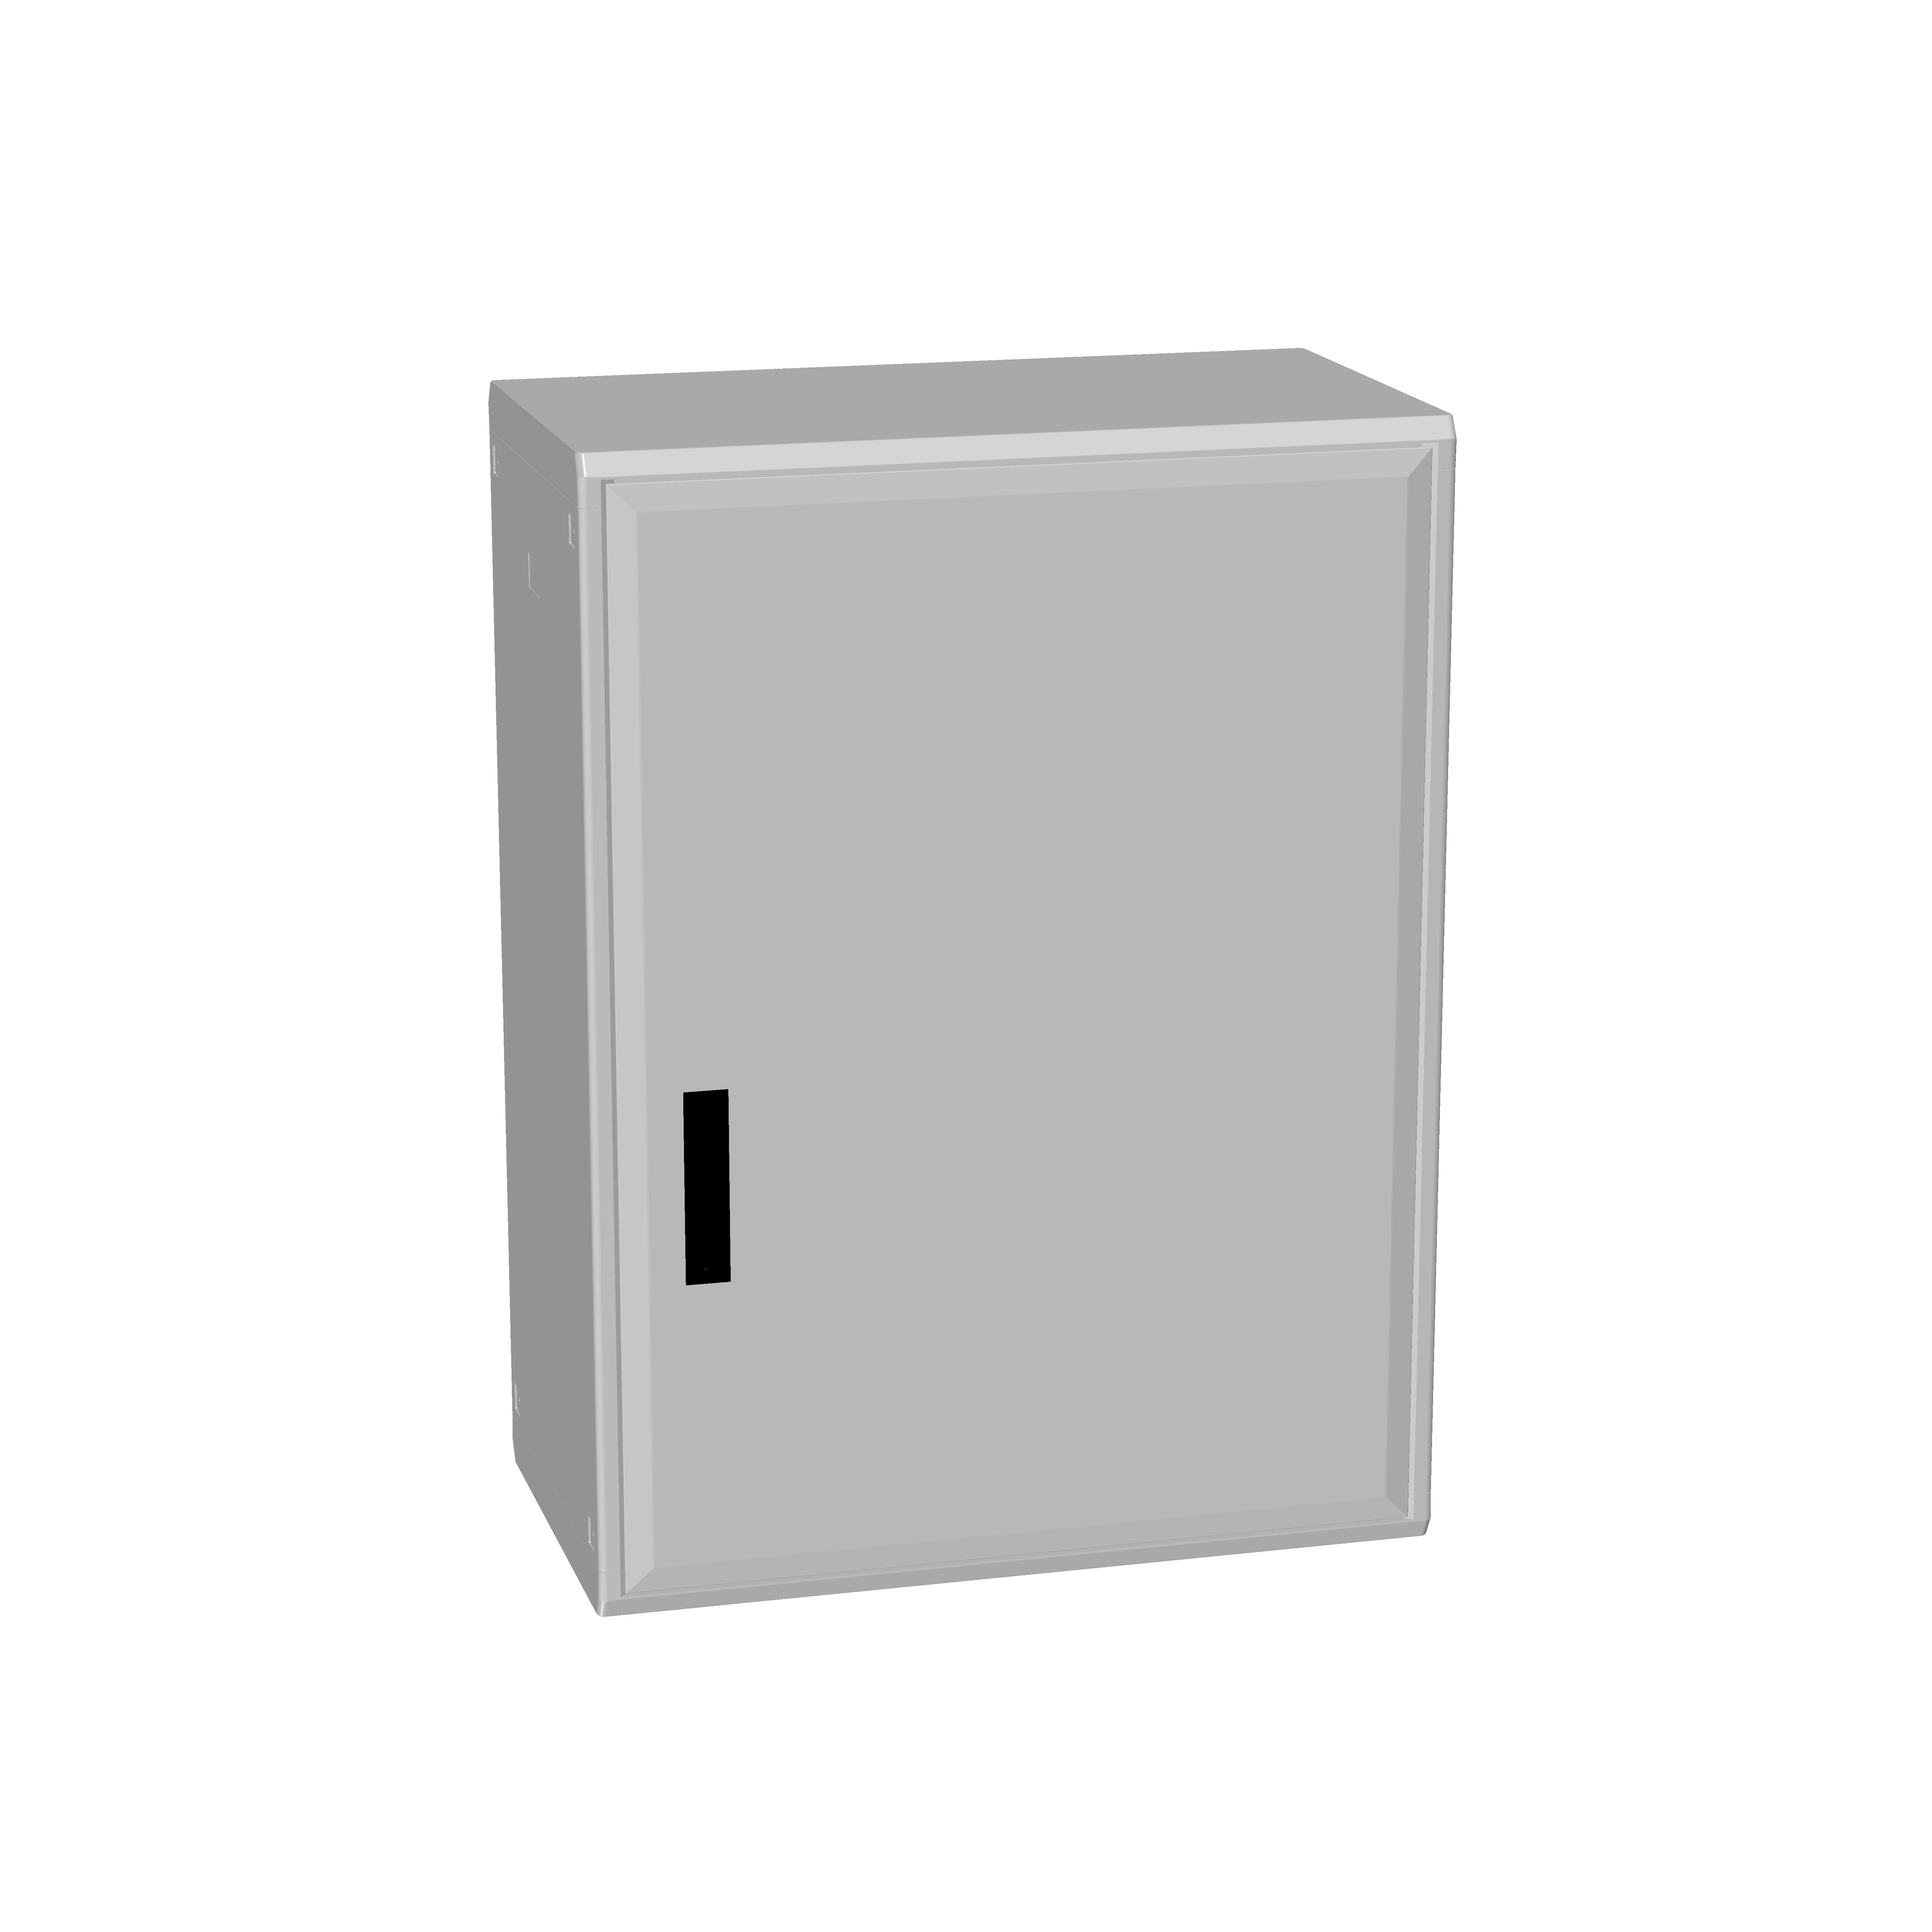 1 Stk Polyesterschrank, eintürig, 1000x750x432 POCC4340--